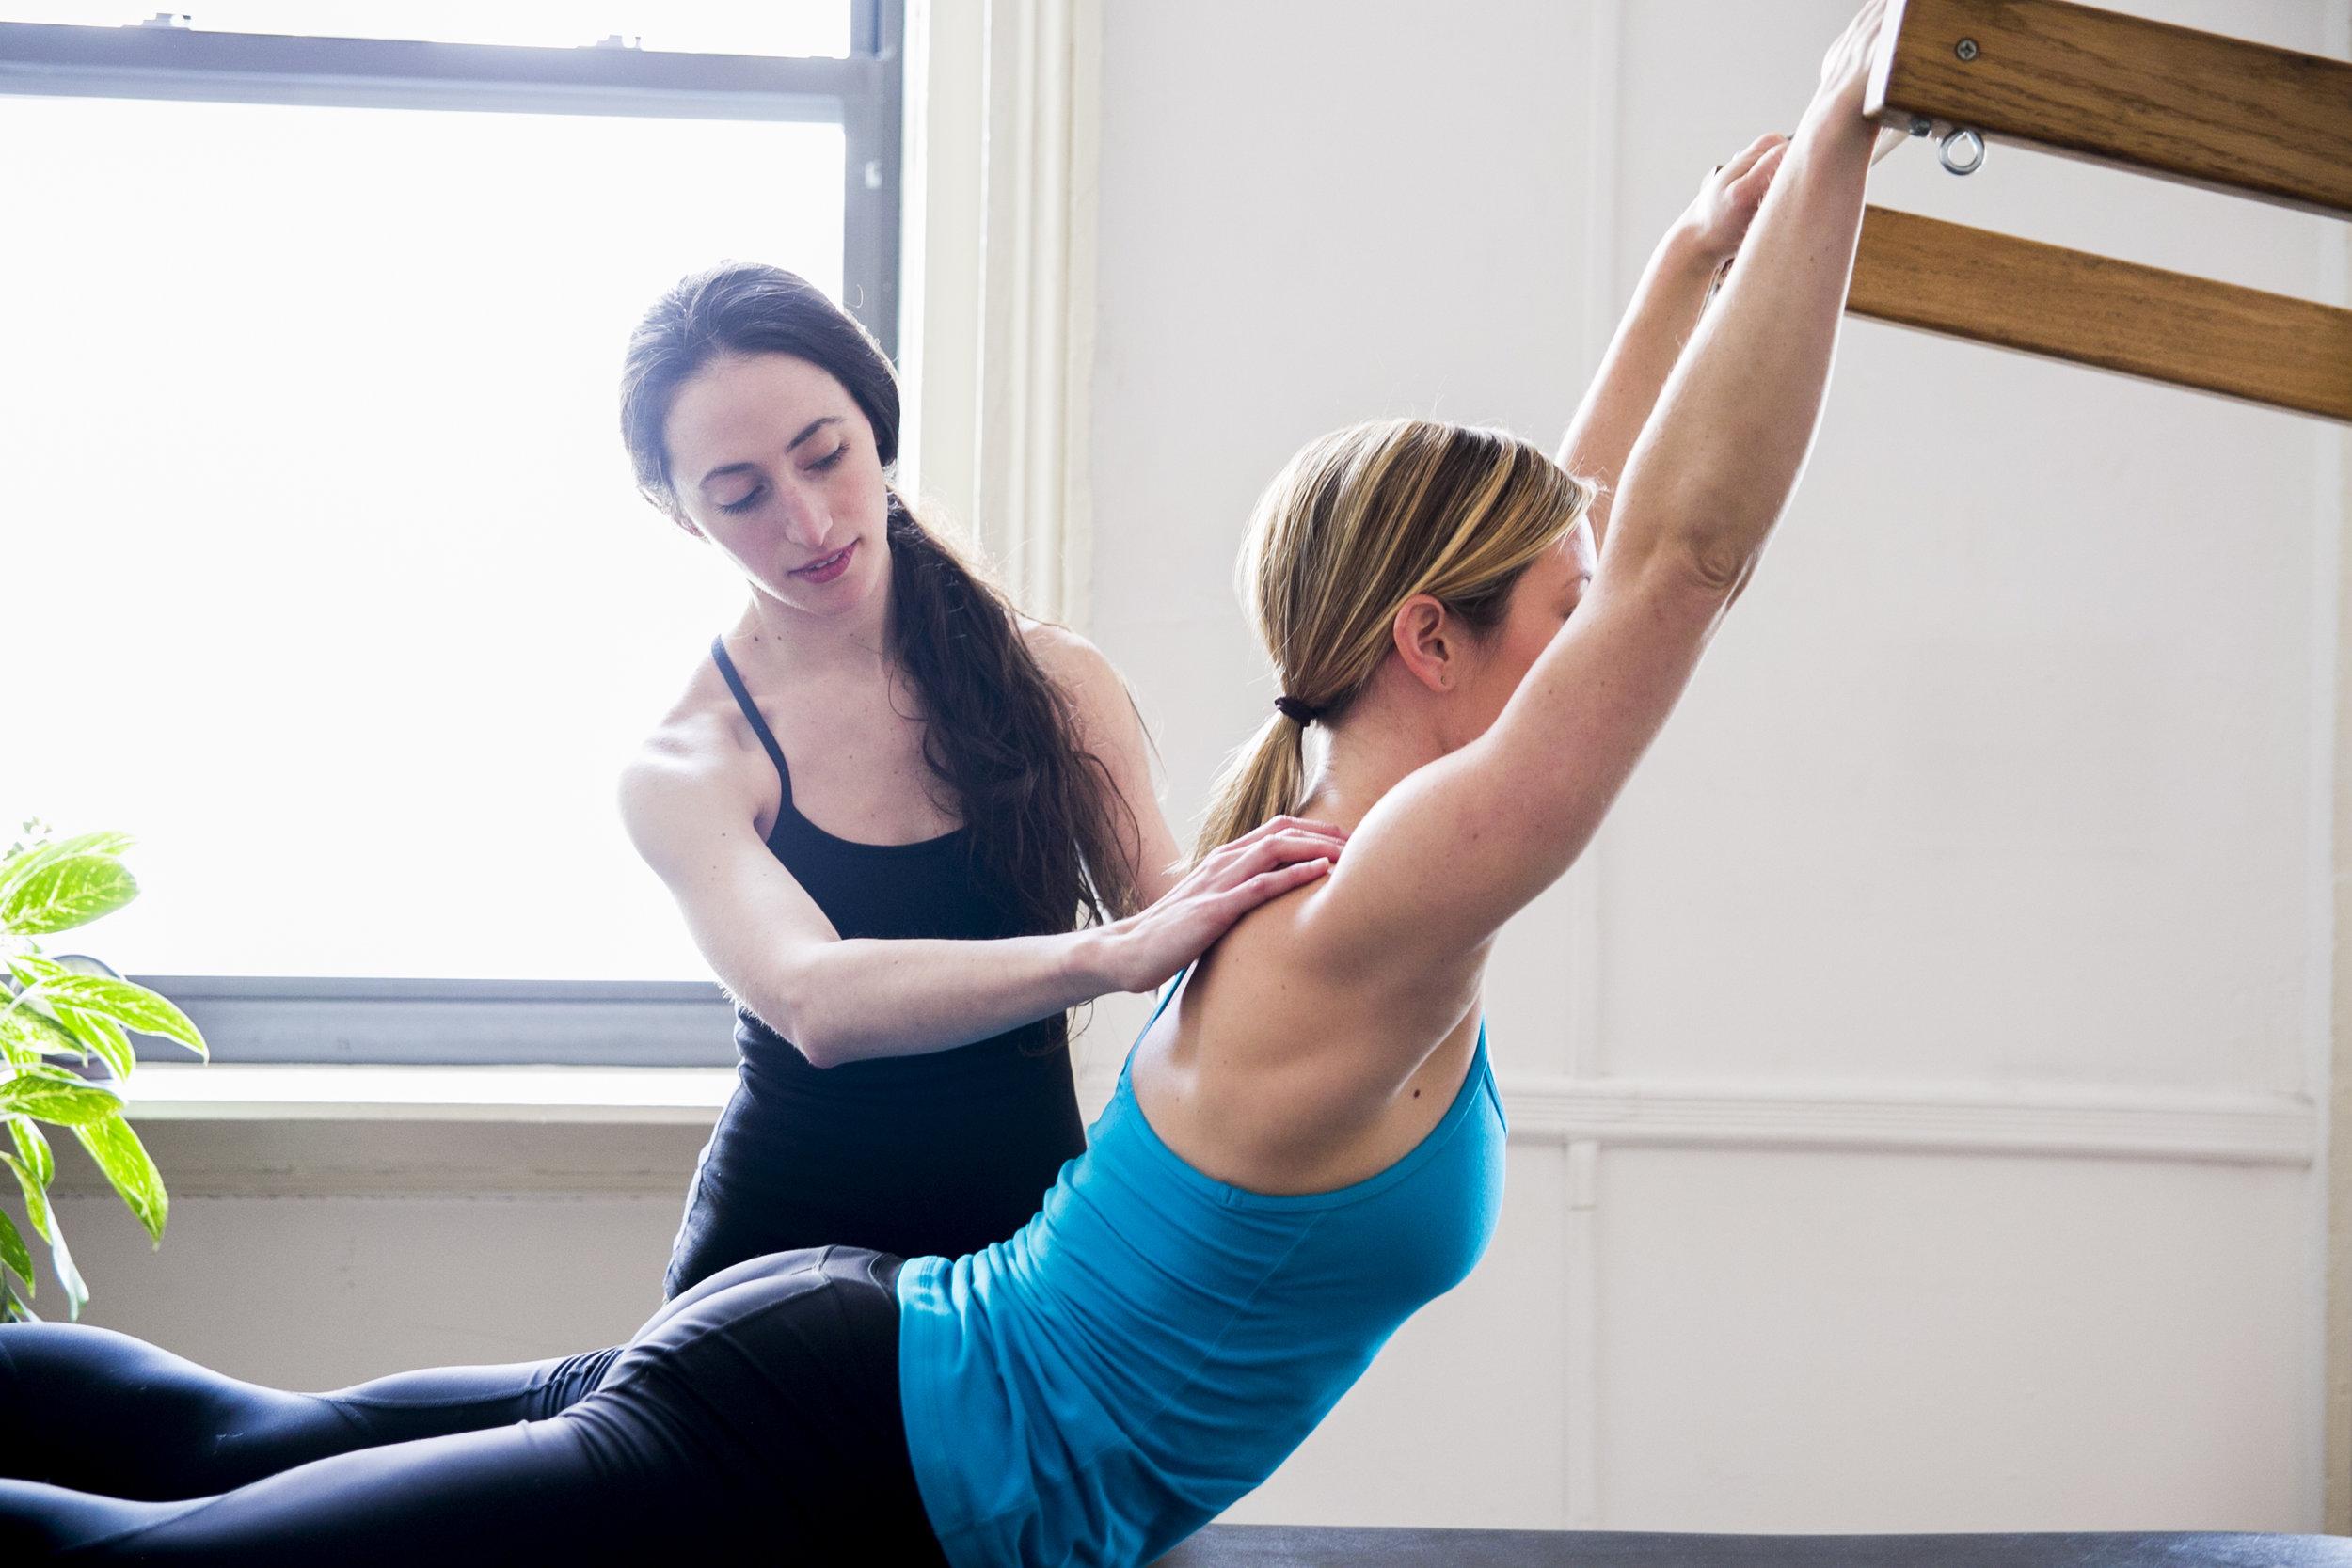 150325_DanielleRusso_Pilates_WhitneyBrowne-87.jpg